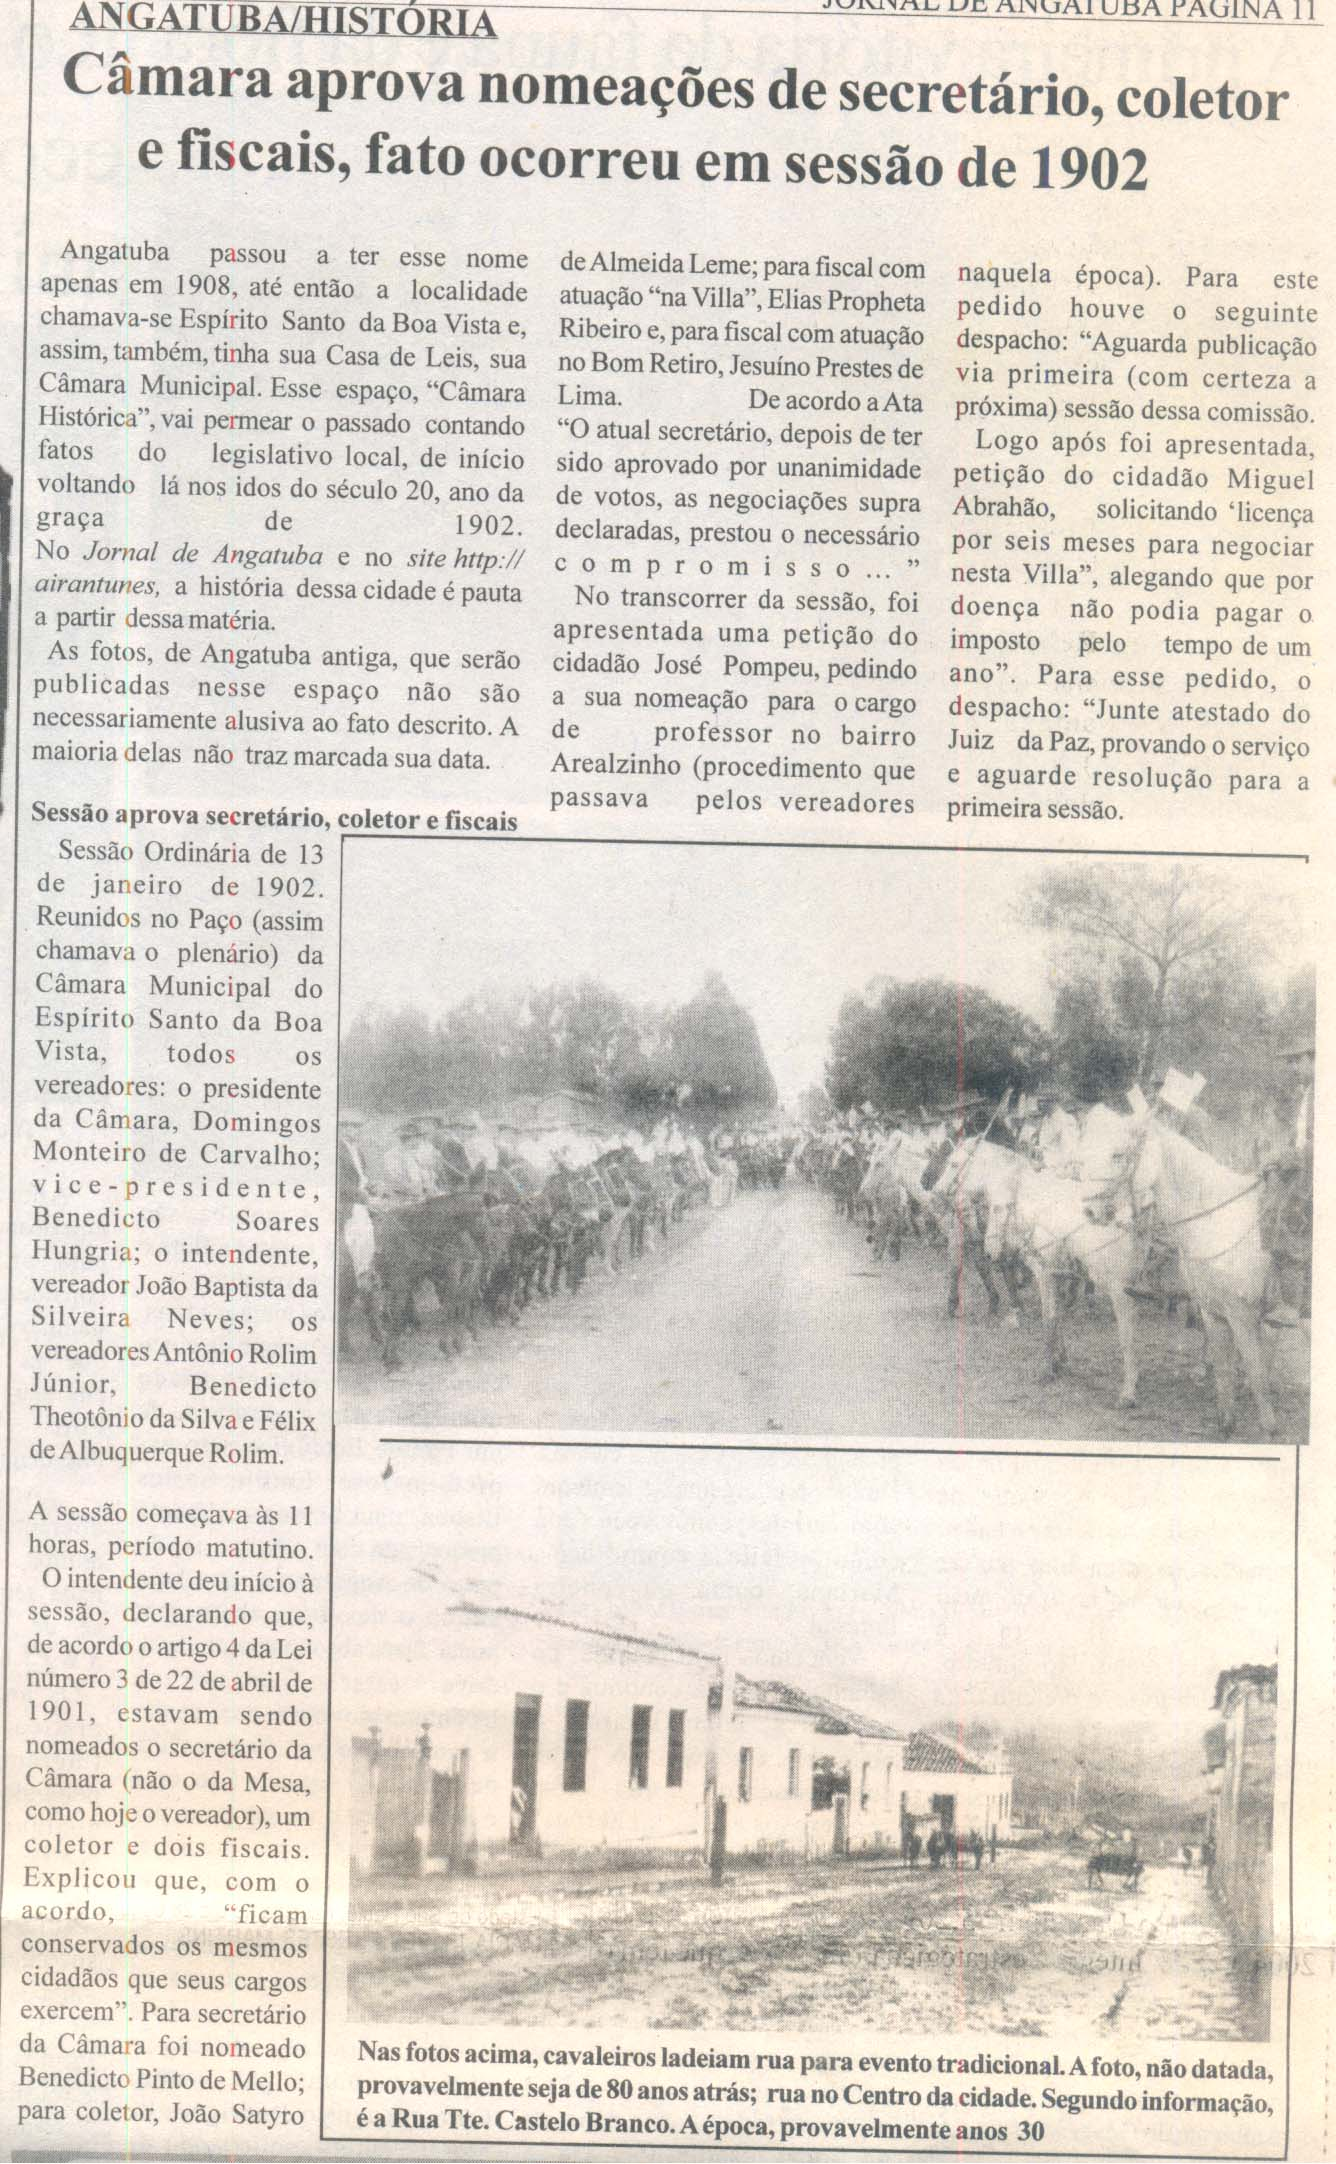 Angatuba história